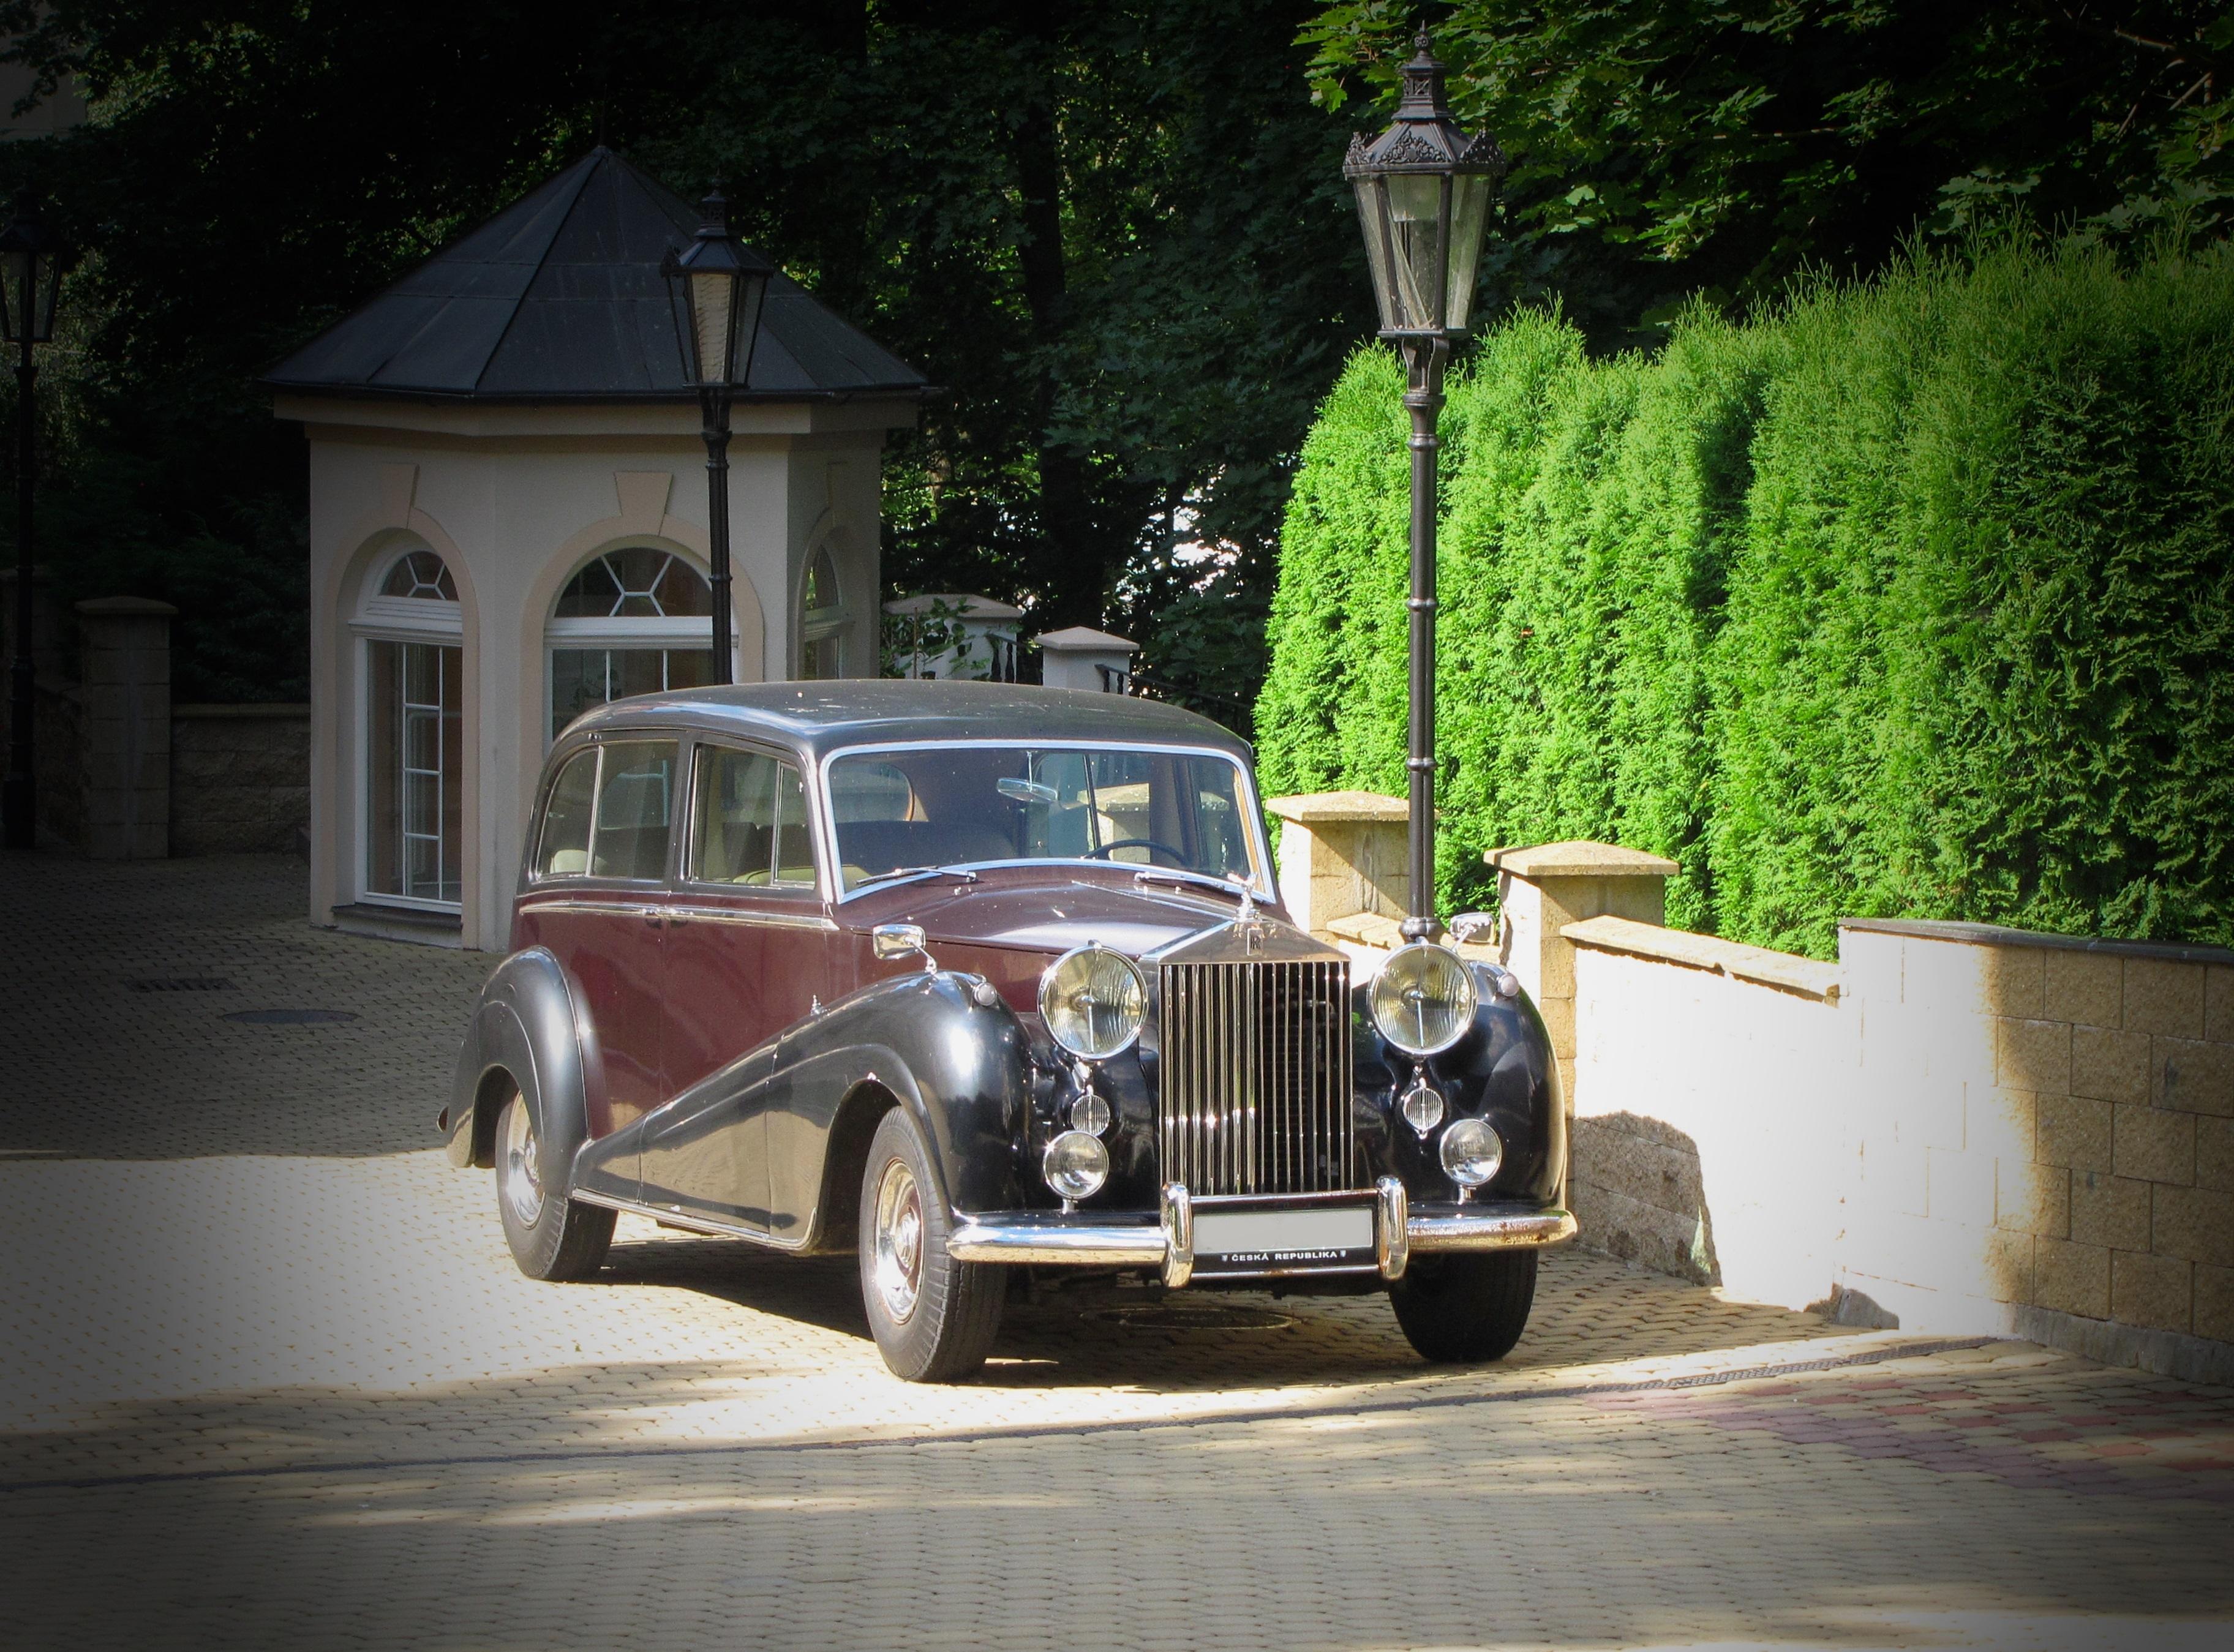 Free Images Transport Motor Vehicle Vintage Car Rolls Royce - Stylish classic cars